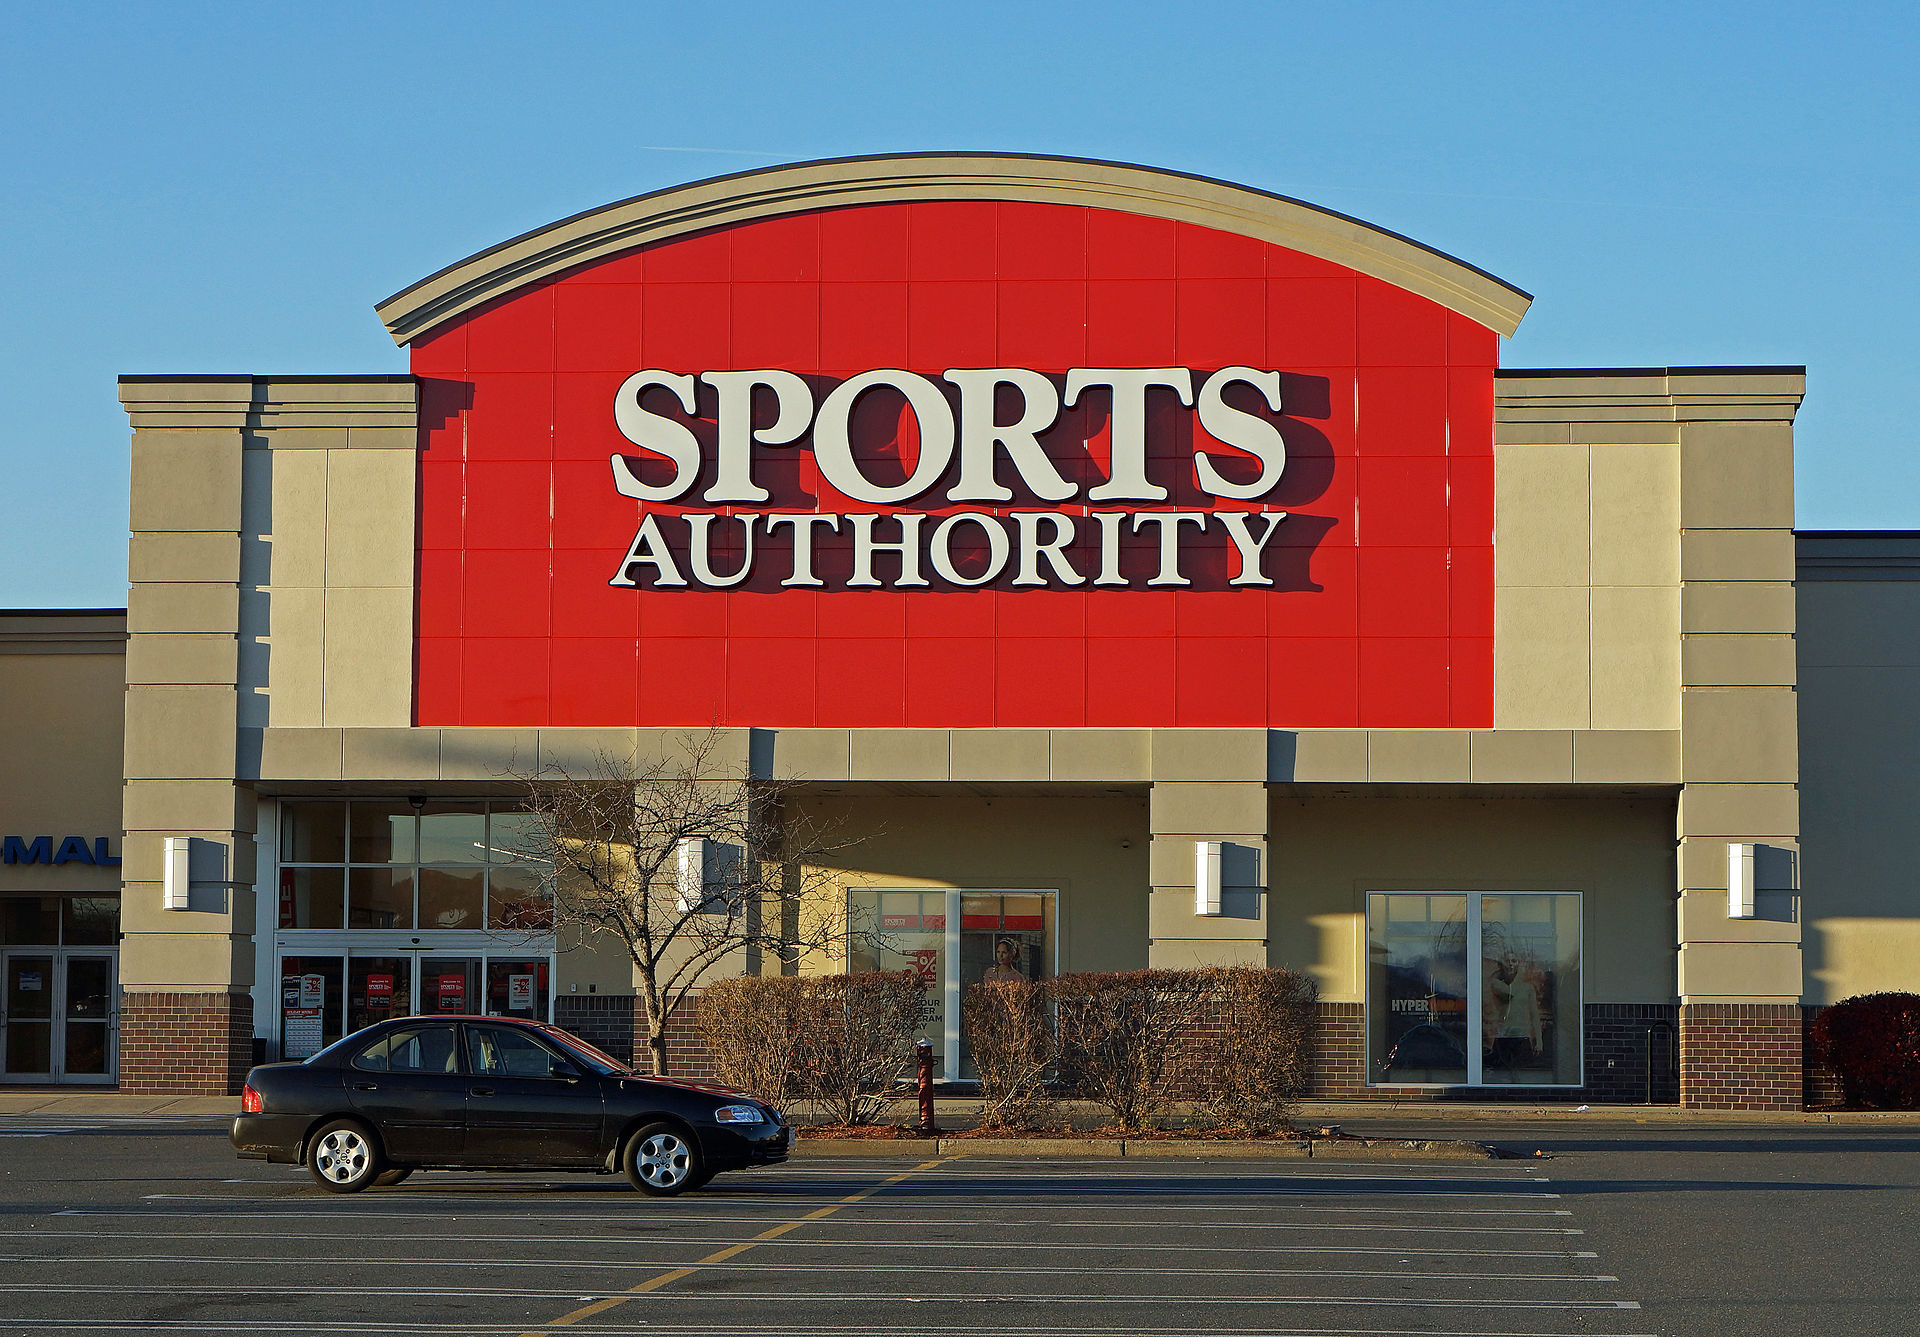 authority sports wikipedia apparel